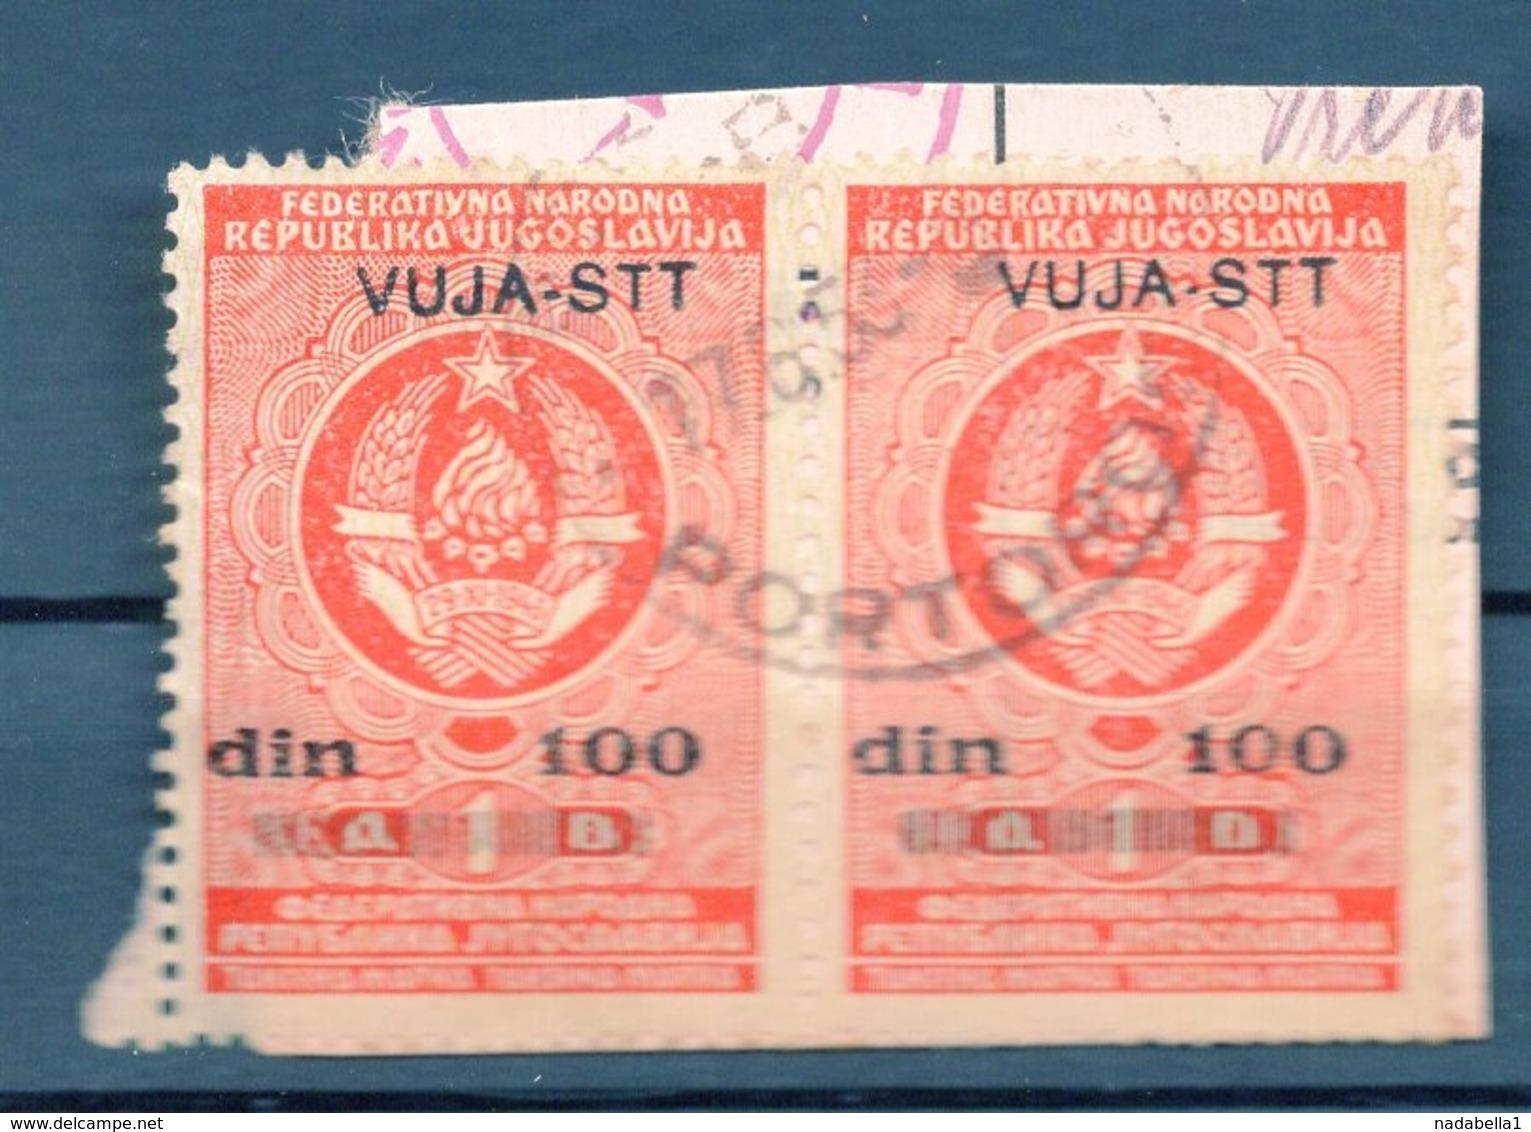 VUJA - STT, 2 REVENUE STAMPS, 100 DINARA, RED - Yugoslavia